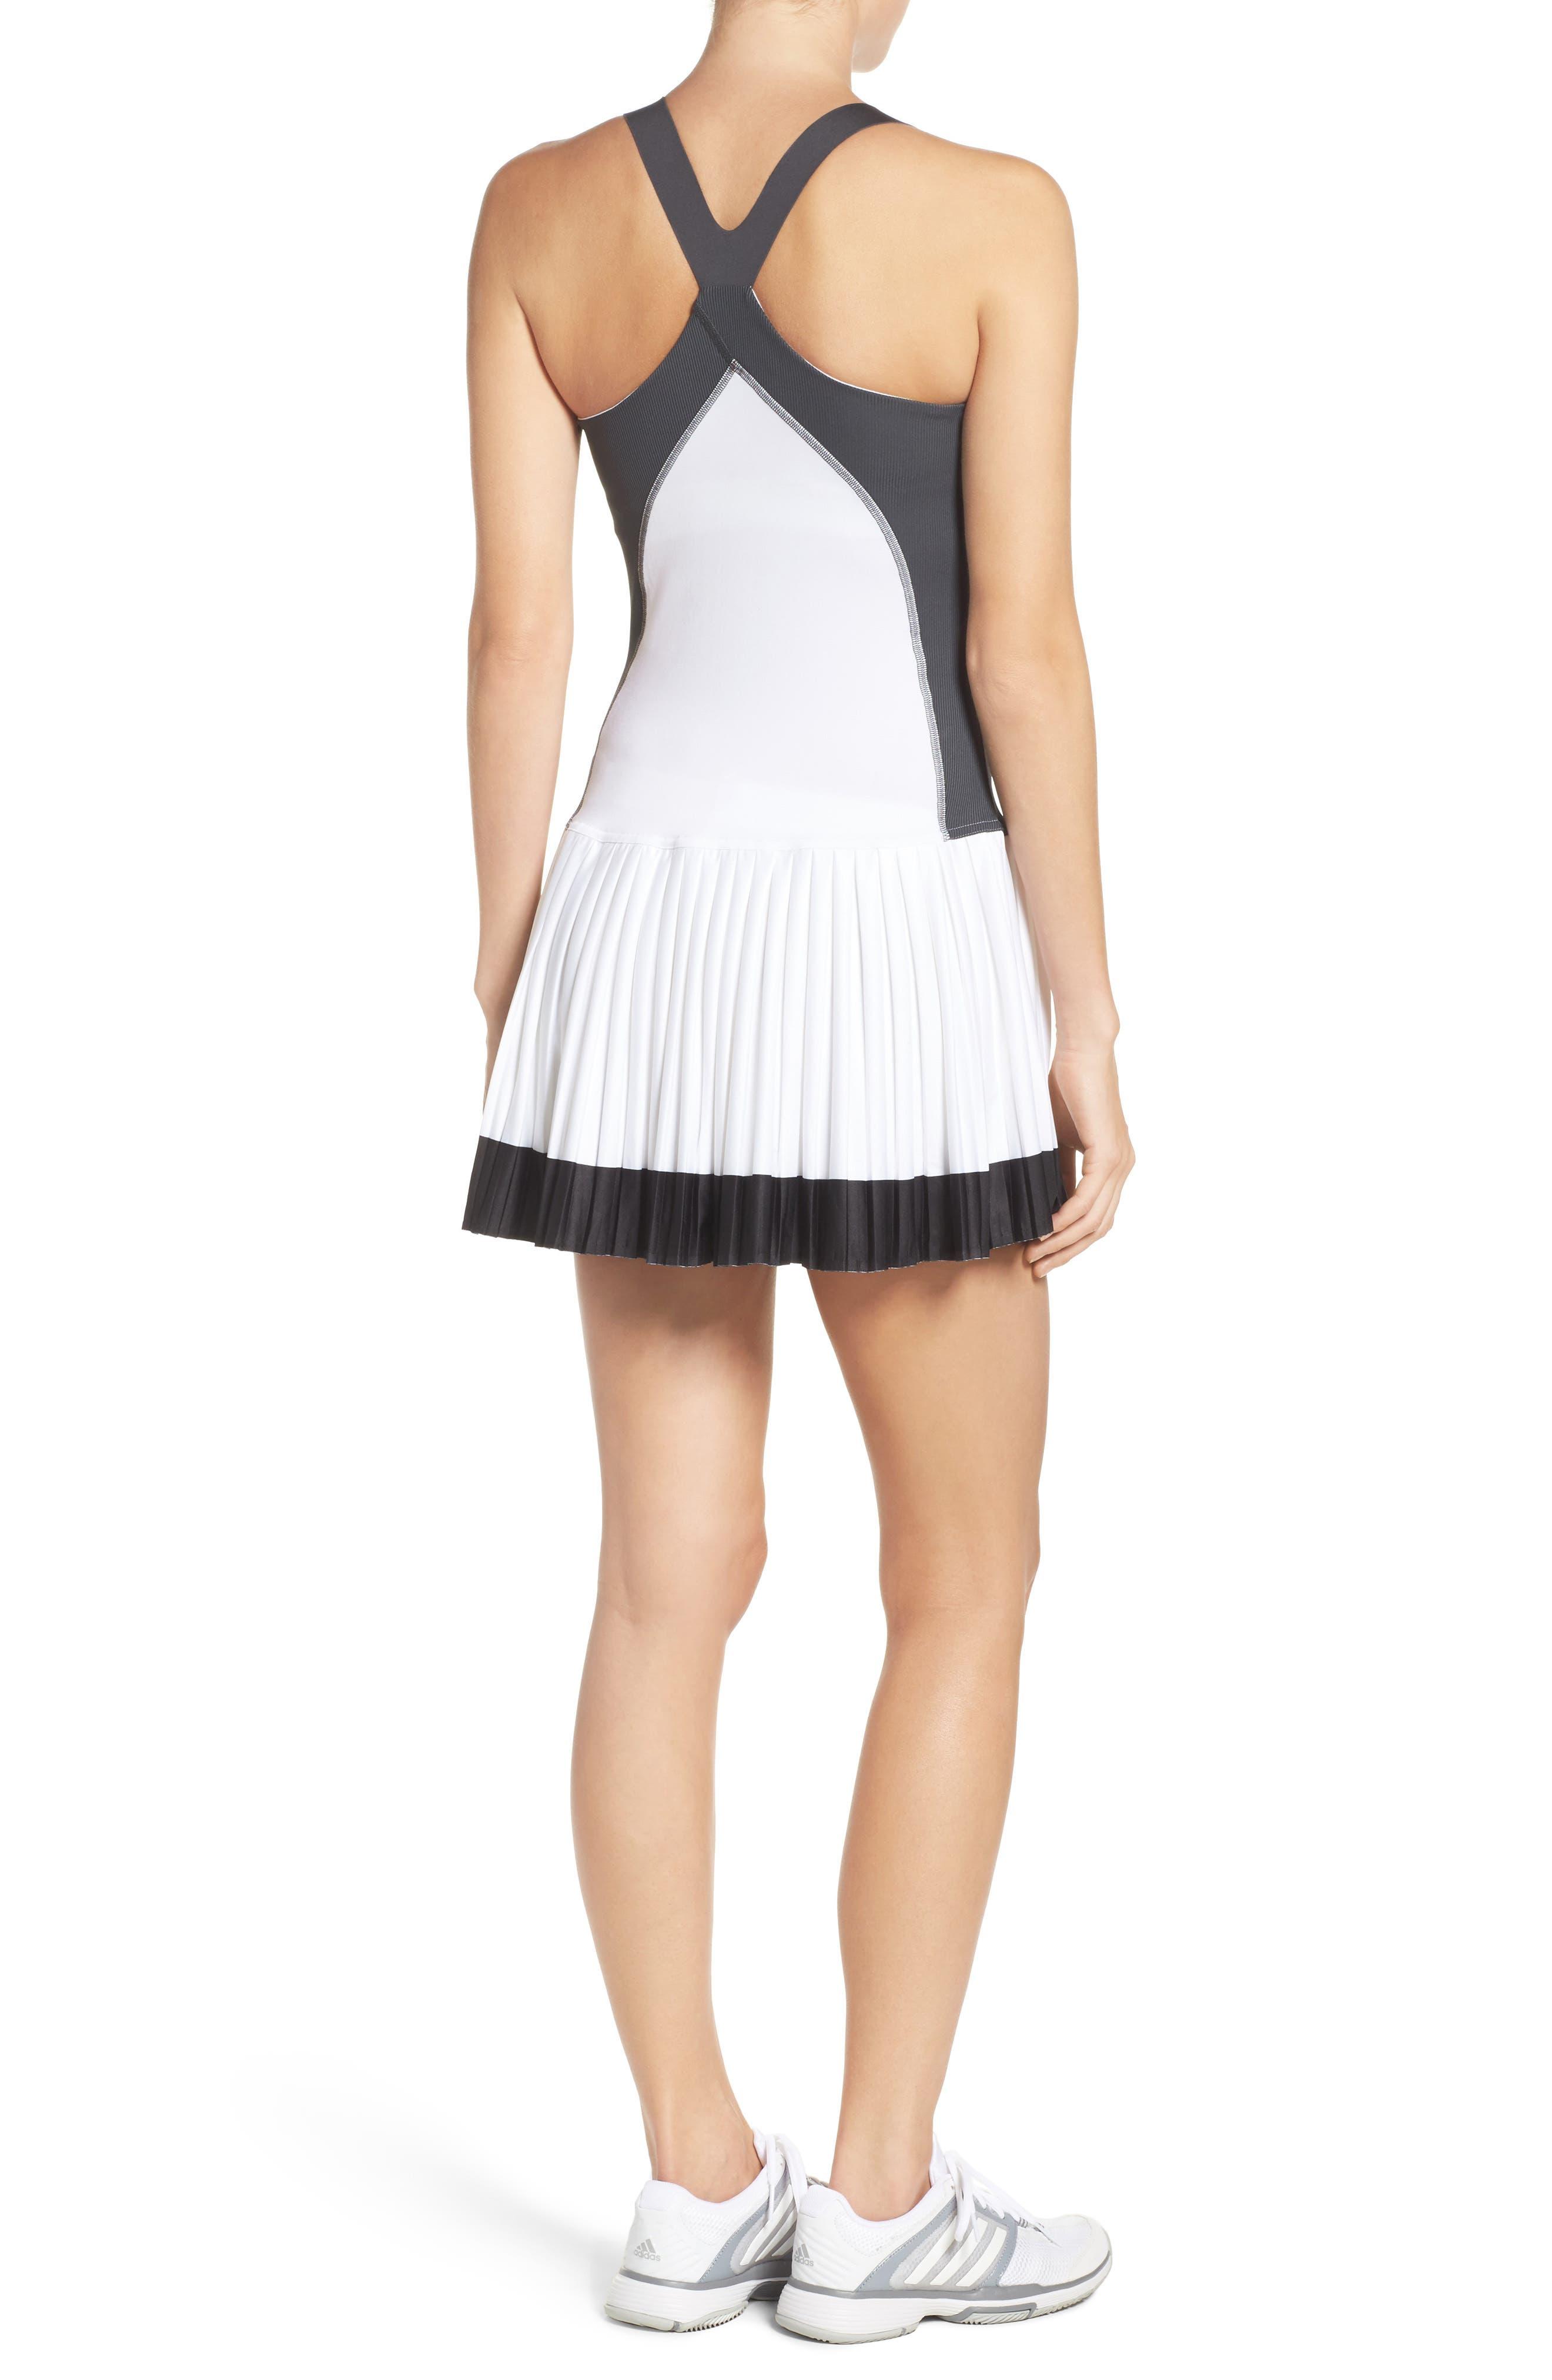 Barricade Tennis Dress & Shorts Set,                             Alternate thumbnail 2, color,                             White/ Solid Grey